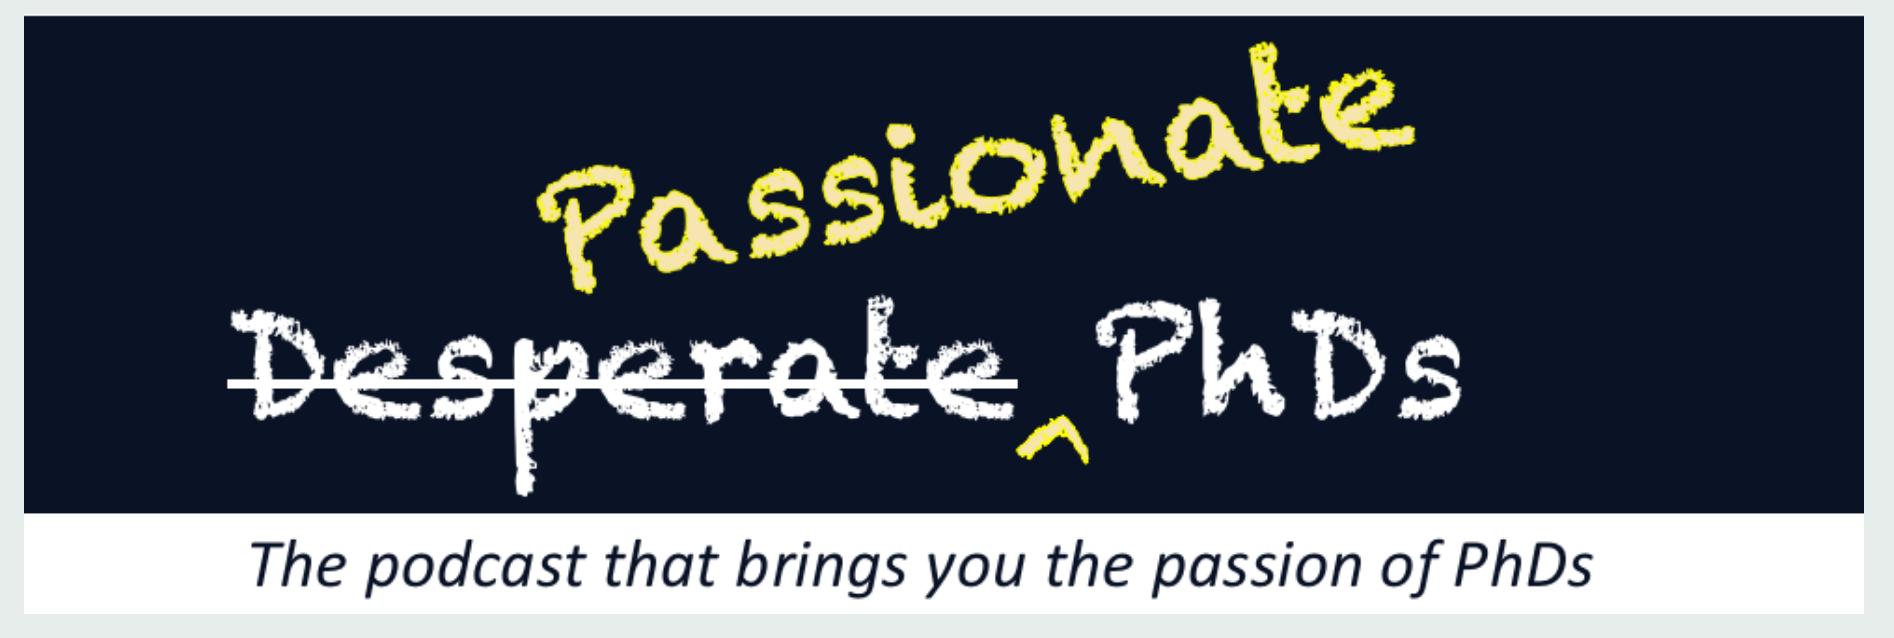 New podcast: Passionate PhDs